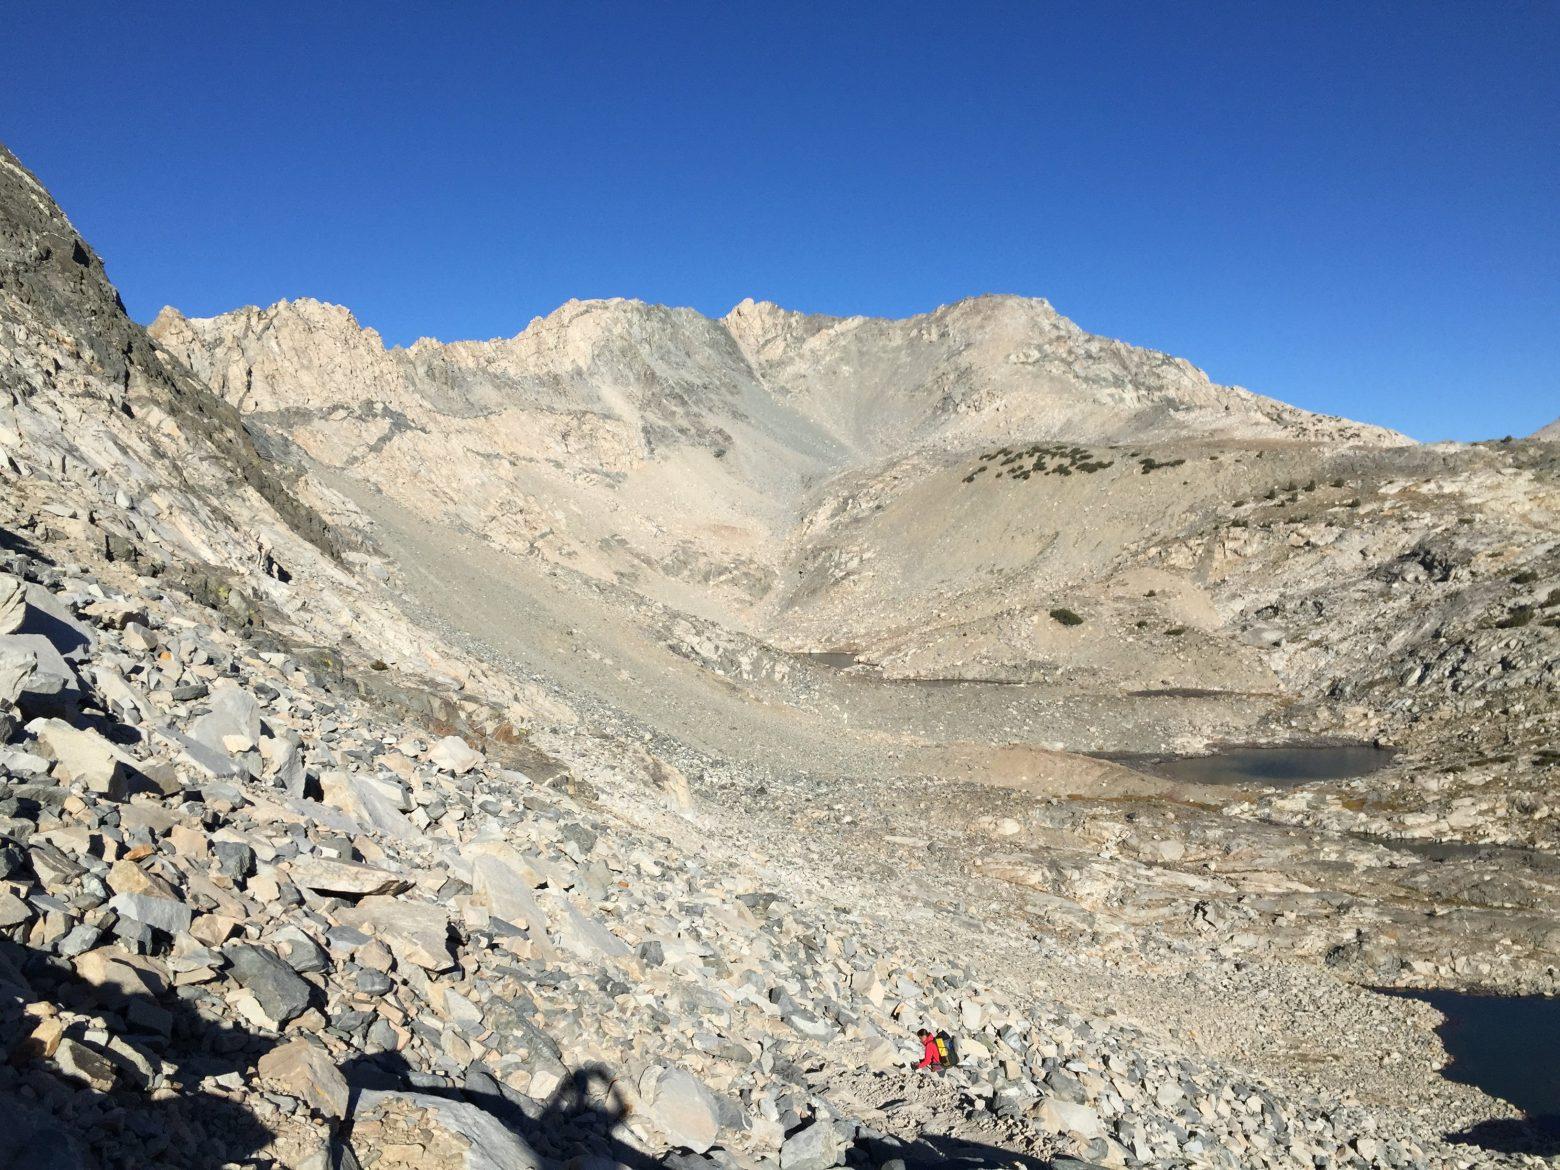 Climbing up to Glen Pass (3)